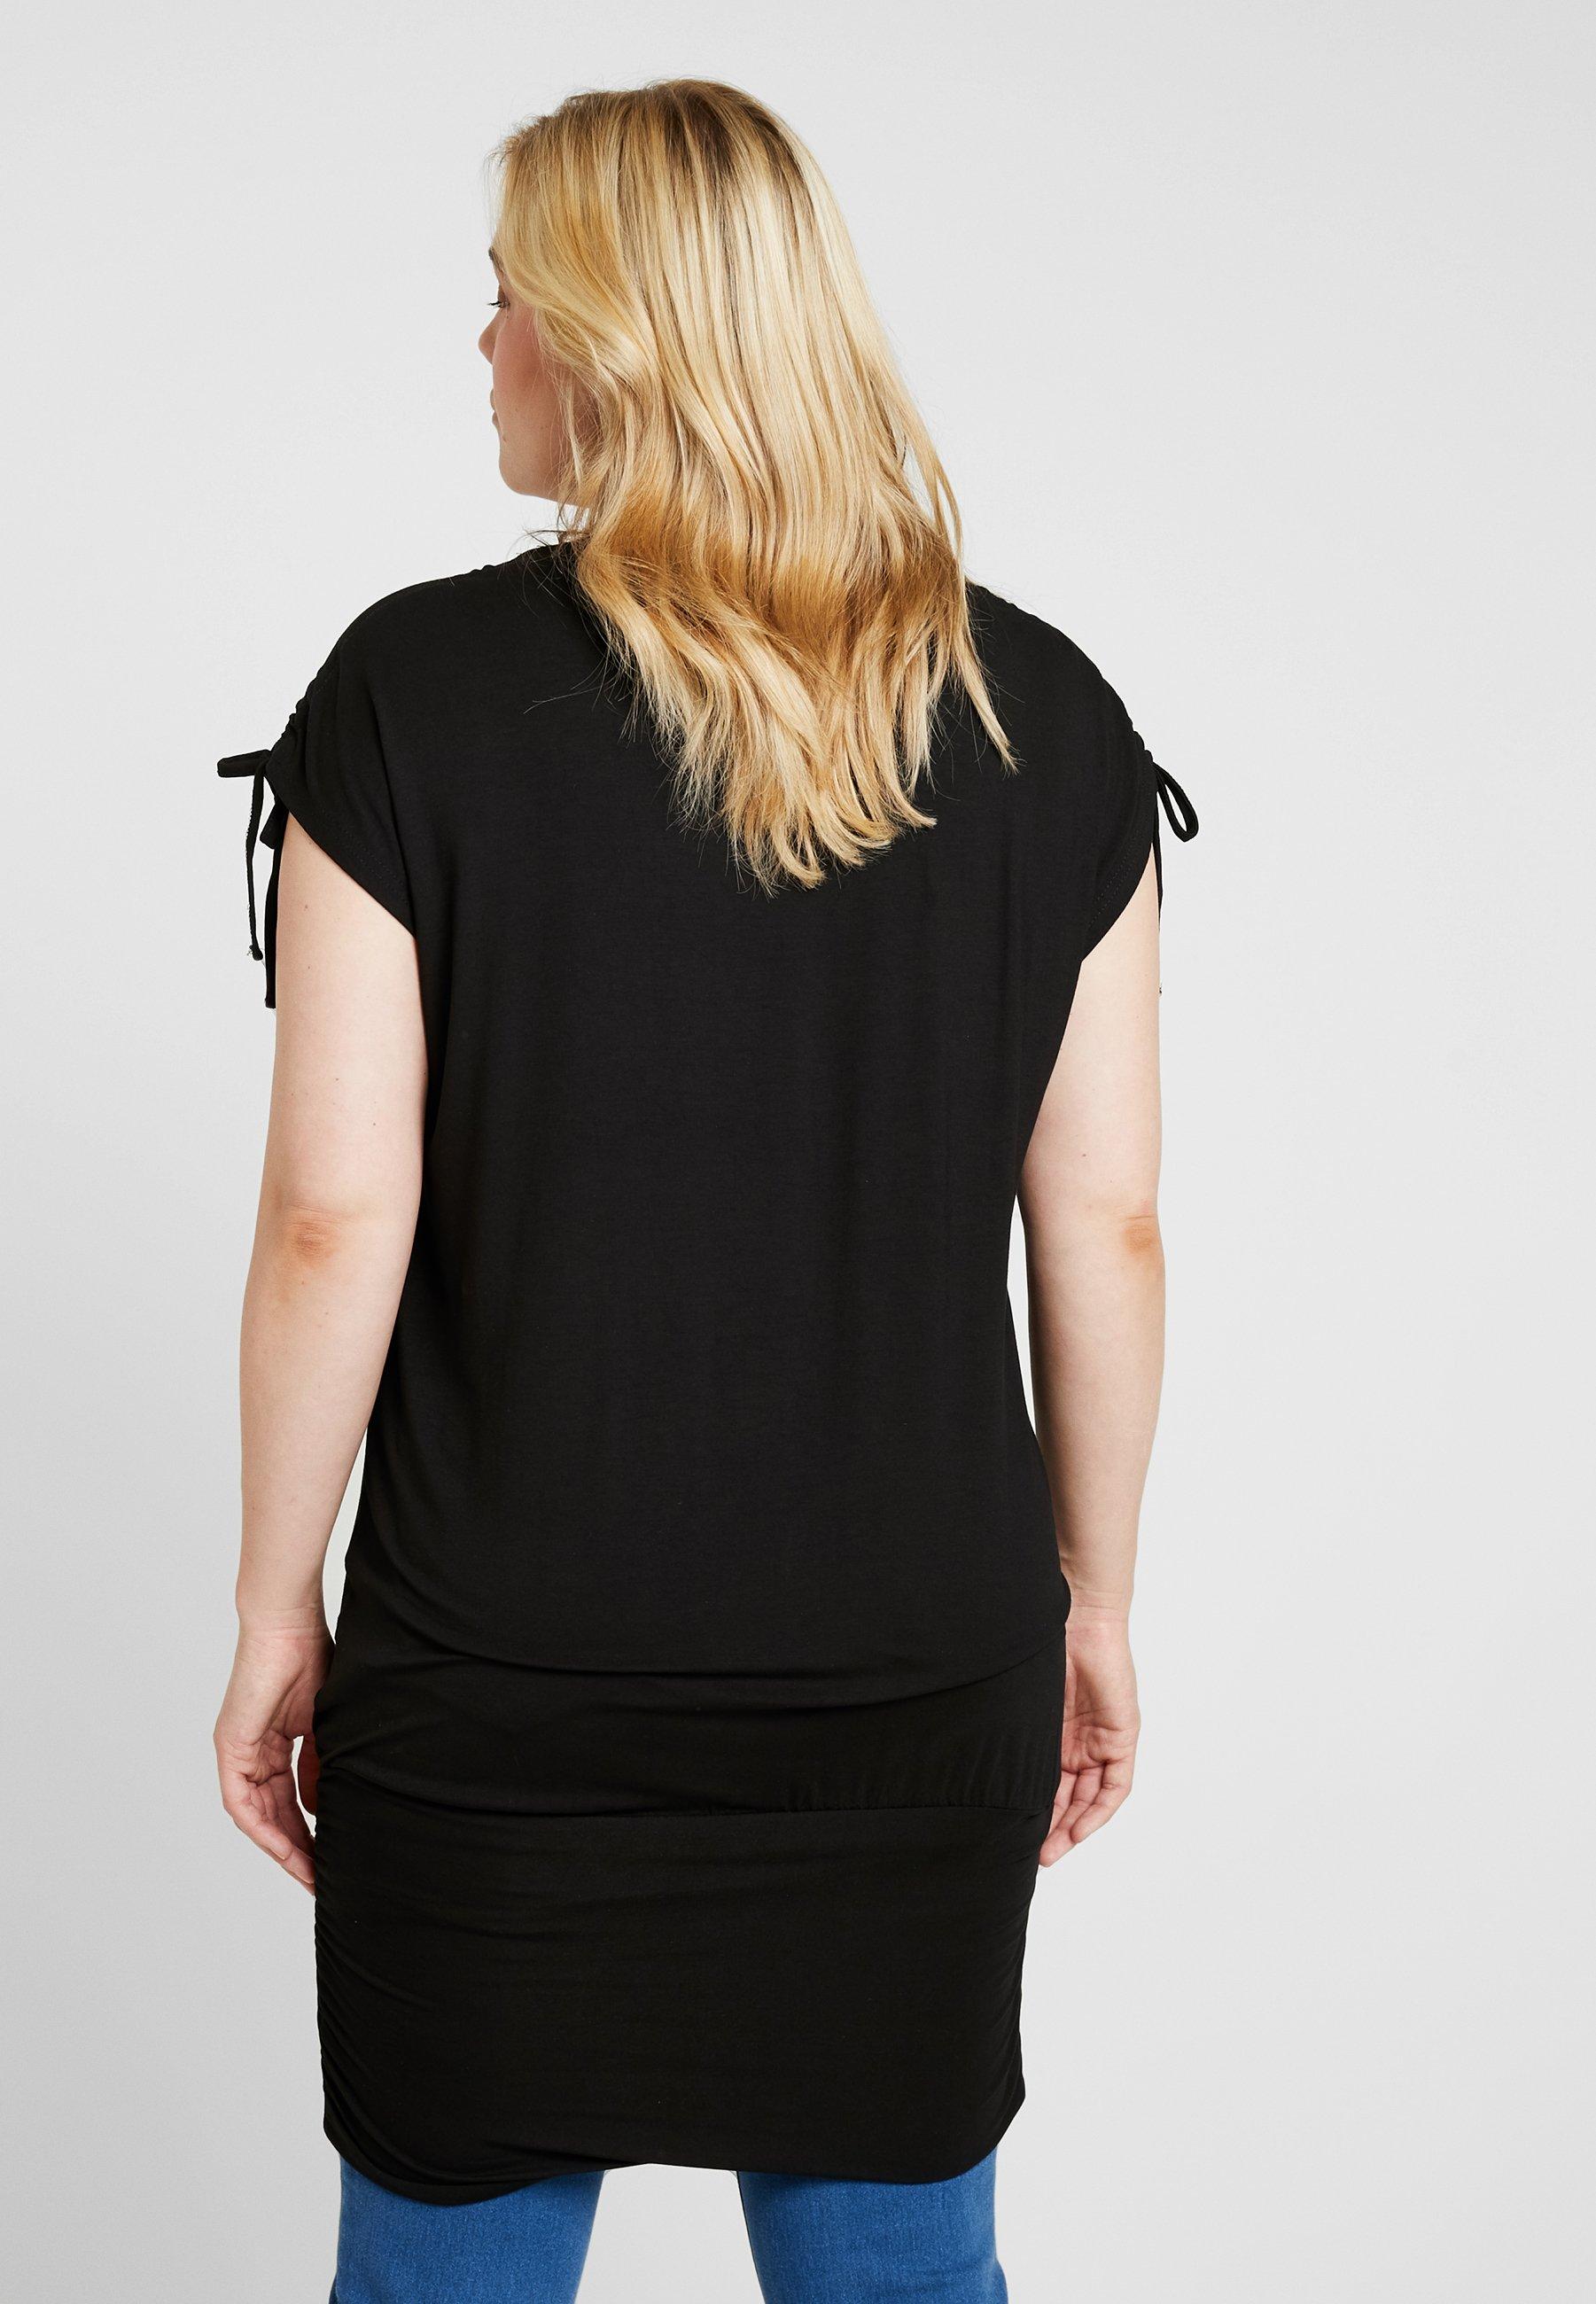 Stampa Simply Be shirt Black Band Hem TunicT Con XZiOPku